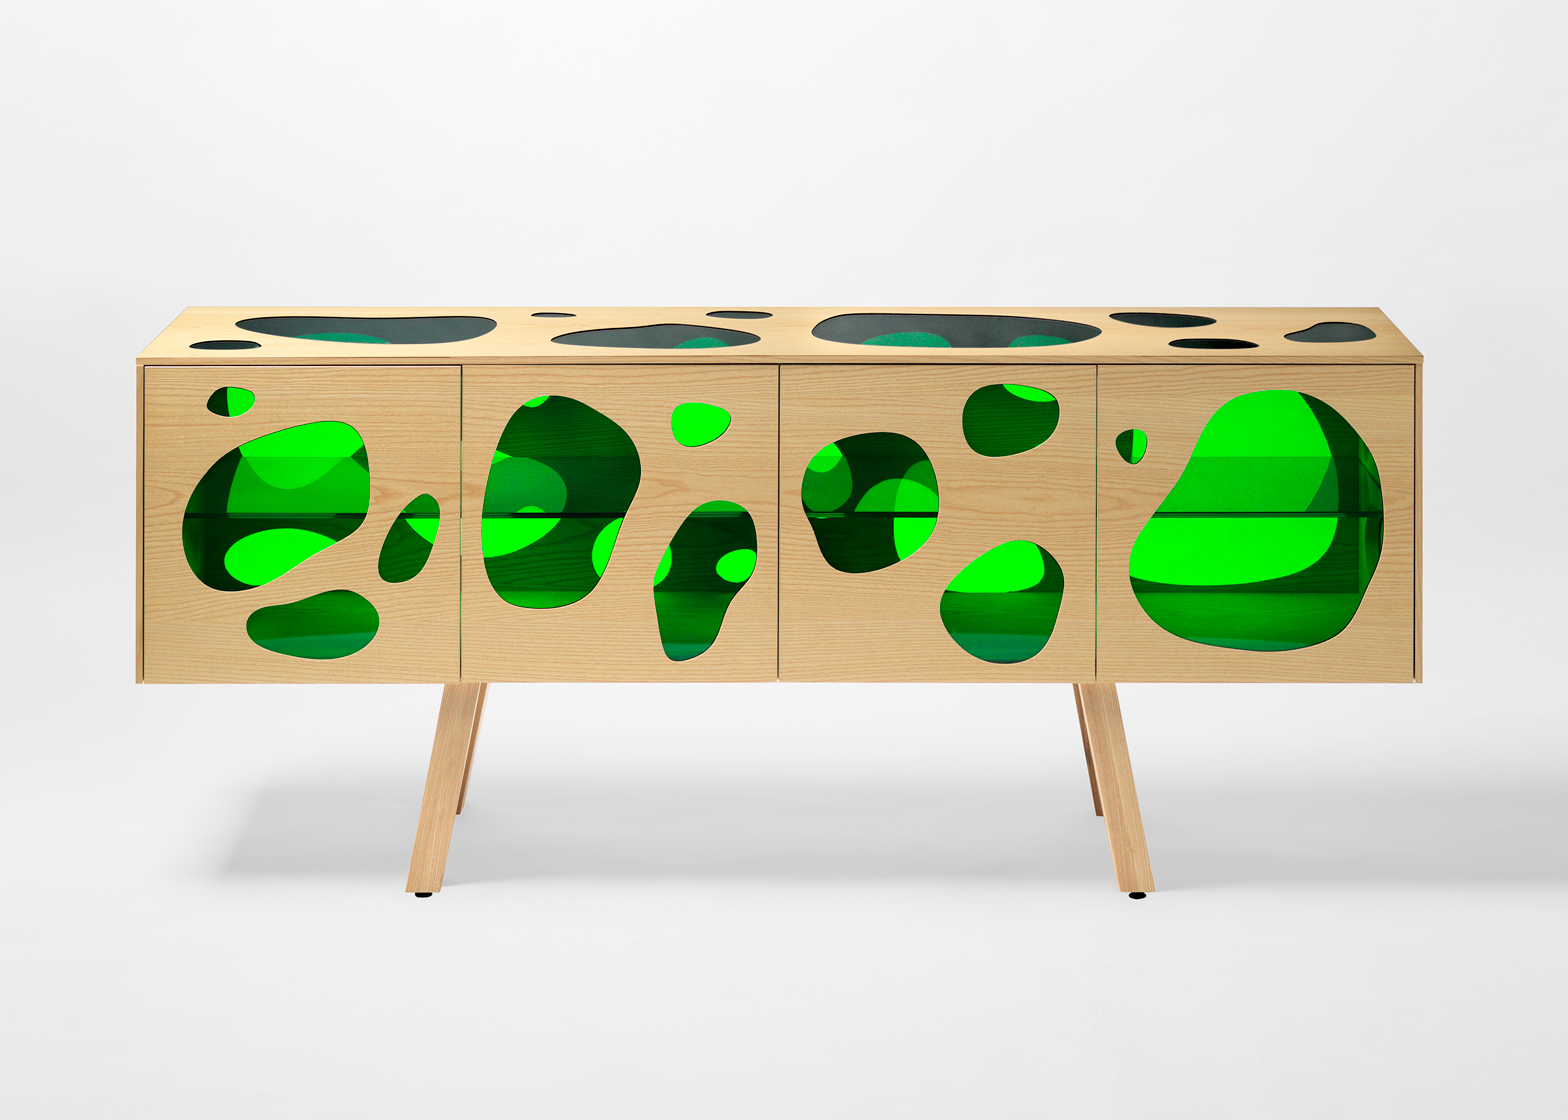 Campana brothers' Aquário cabinet features coloured glass